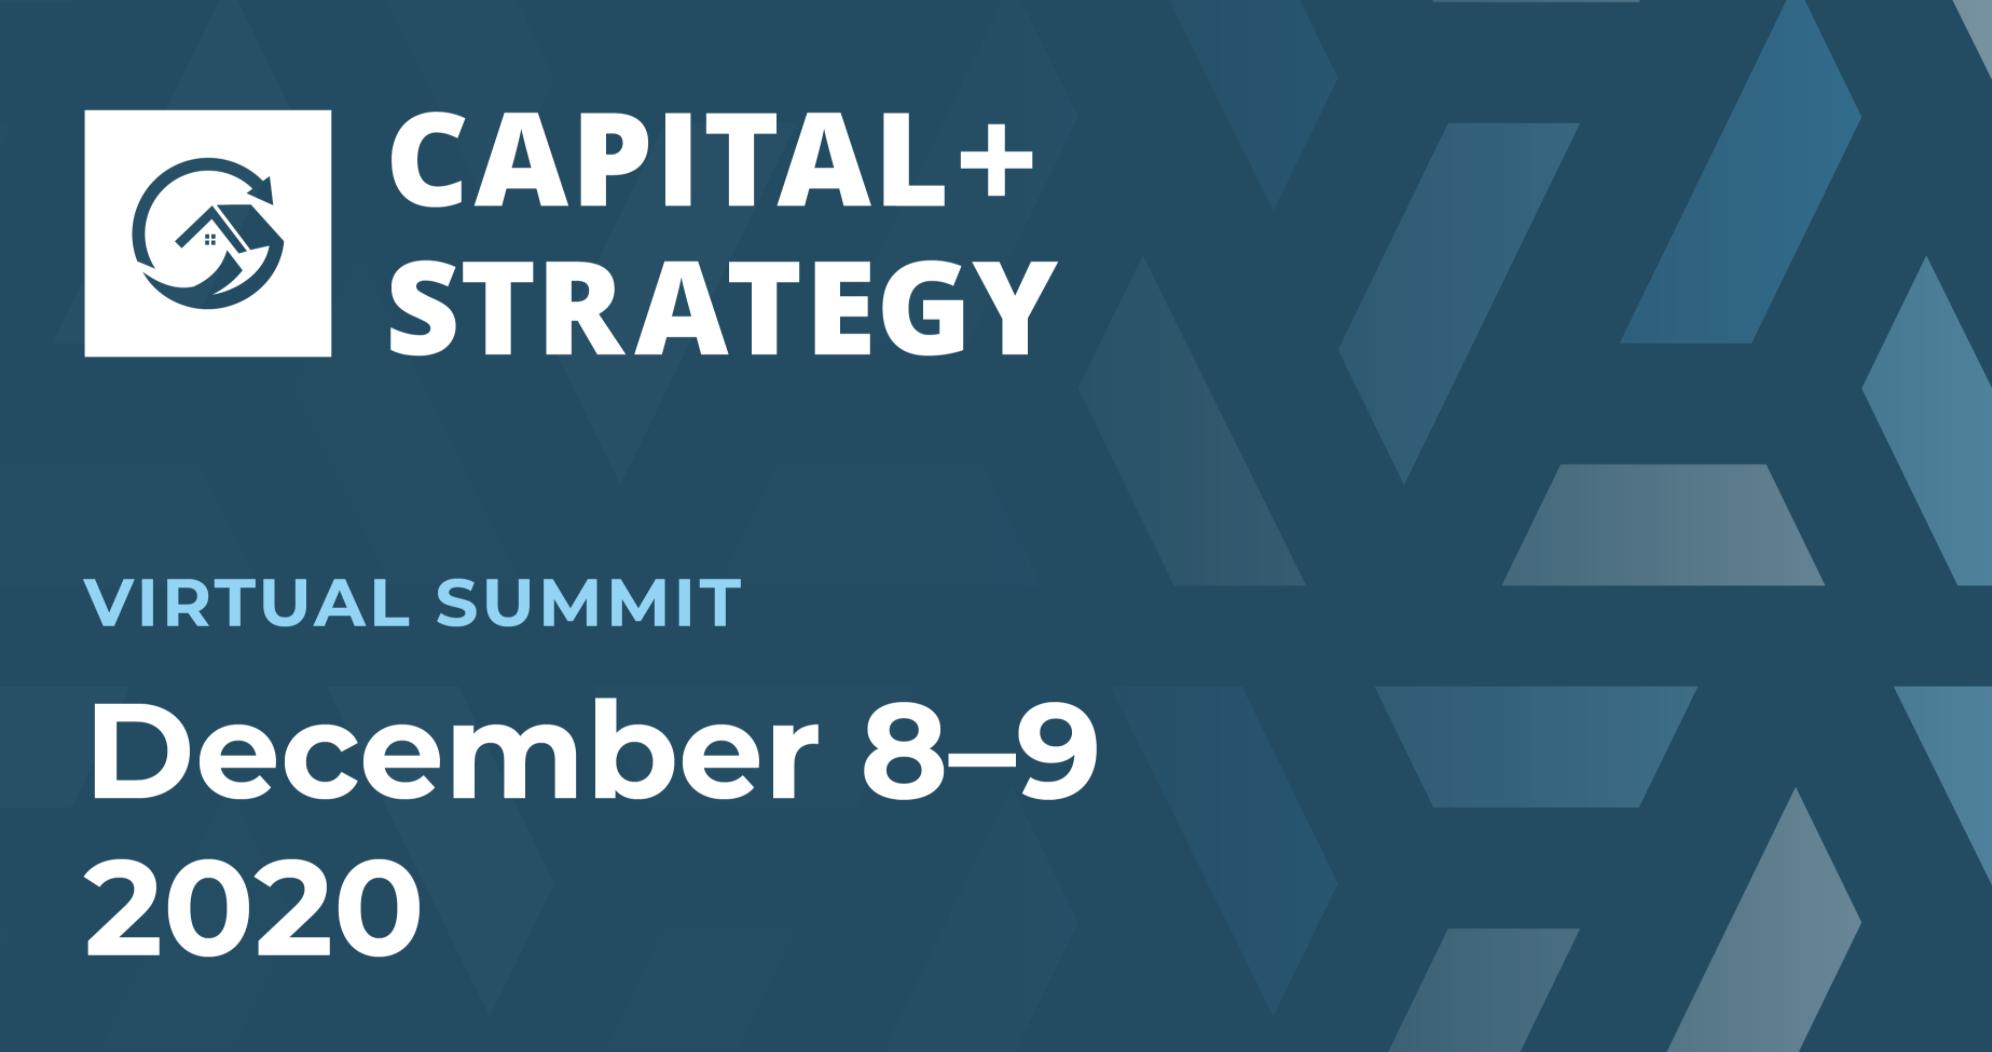 Capital + Strategy Virtual Summit 2020